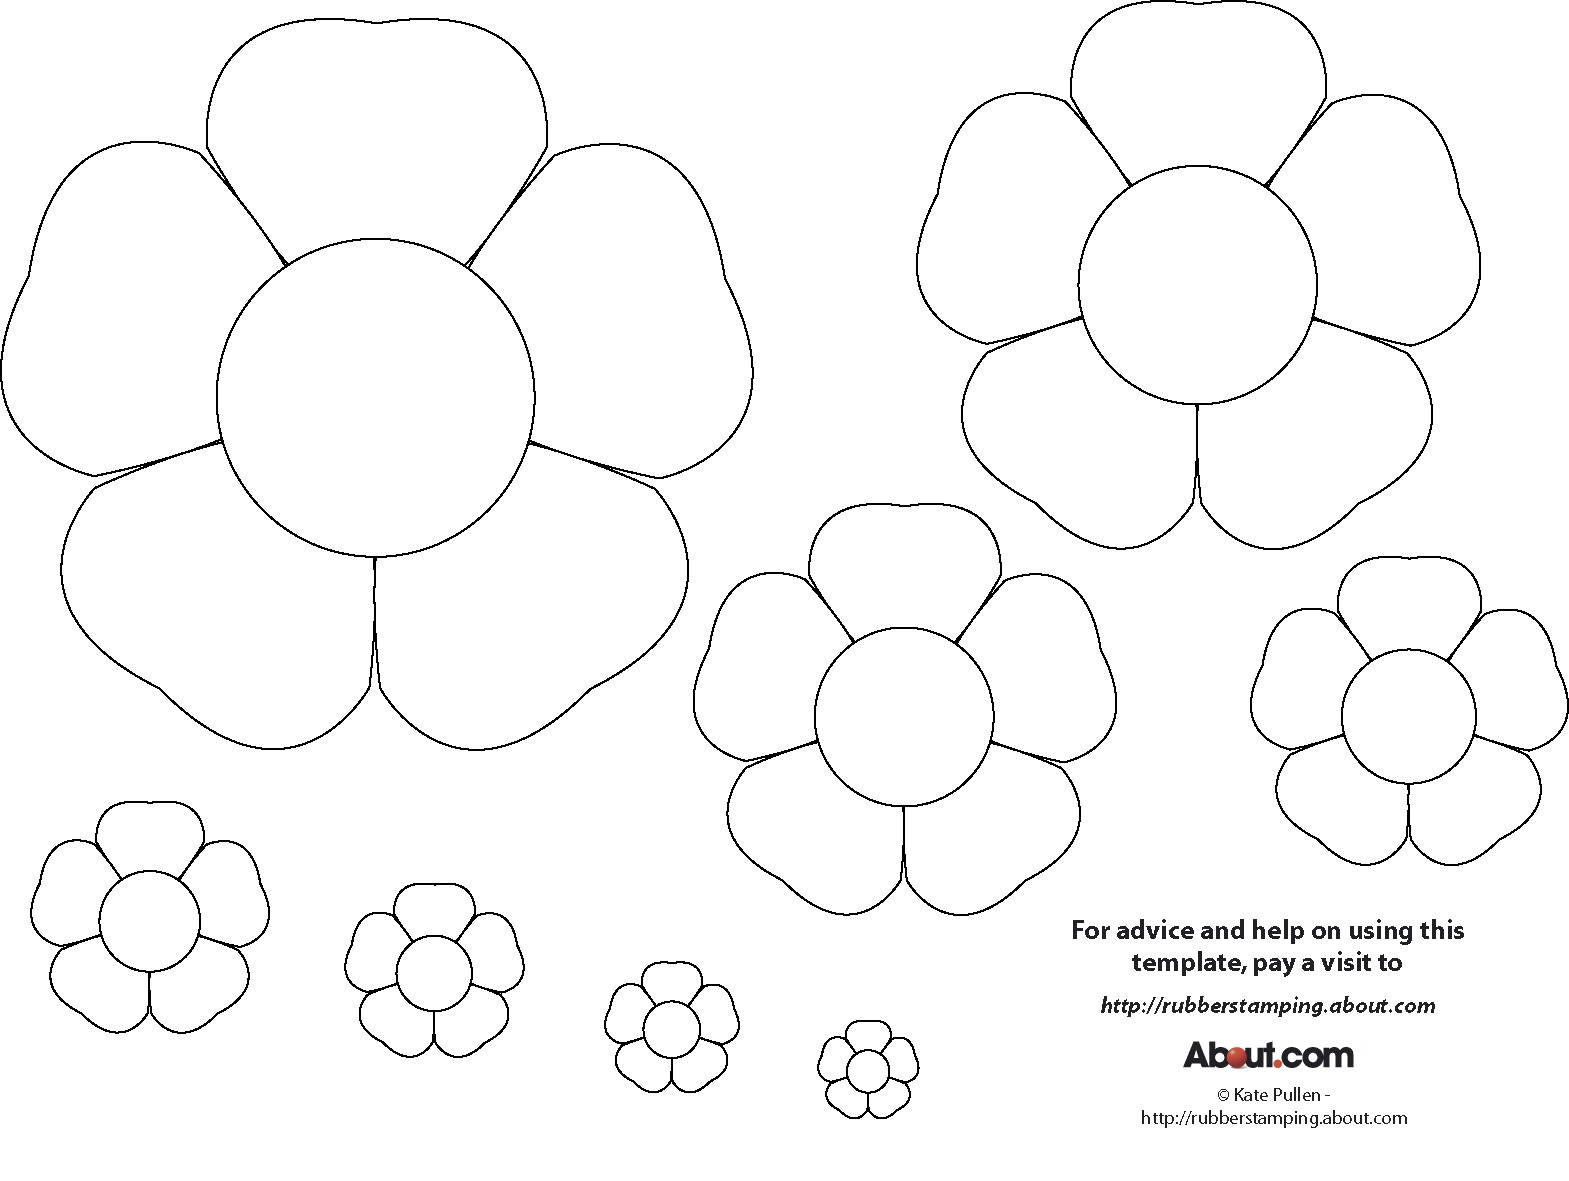 15 Printable Flower Patterns Designs Images - Paper Flower Templates - Free Printable Flower Template